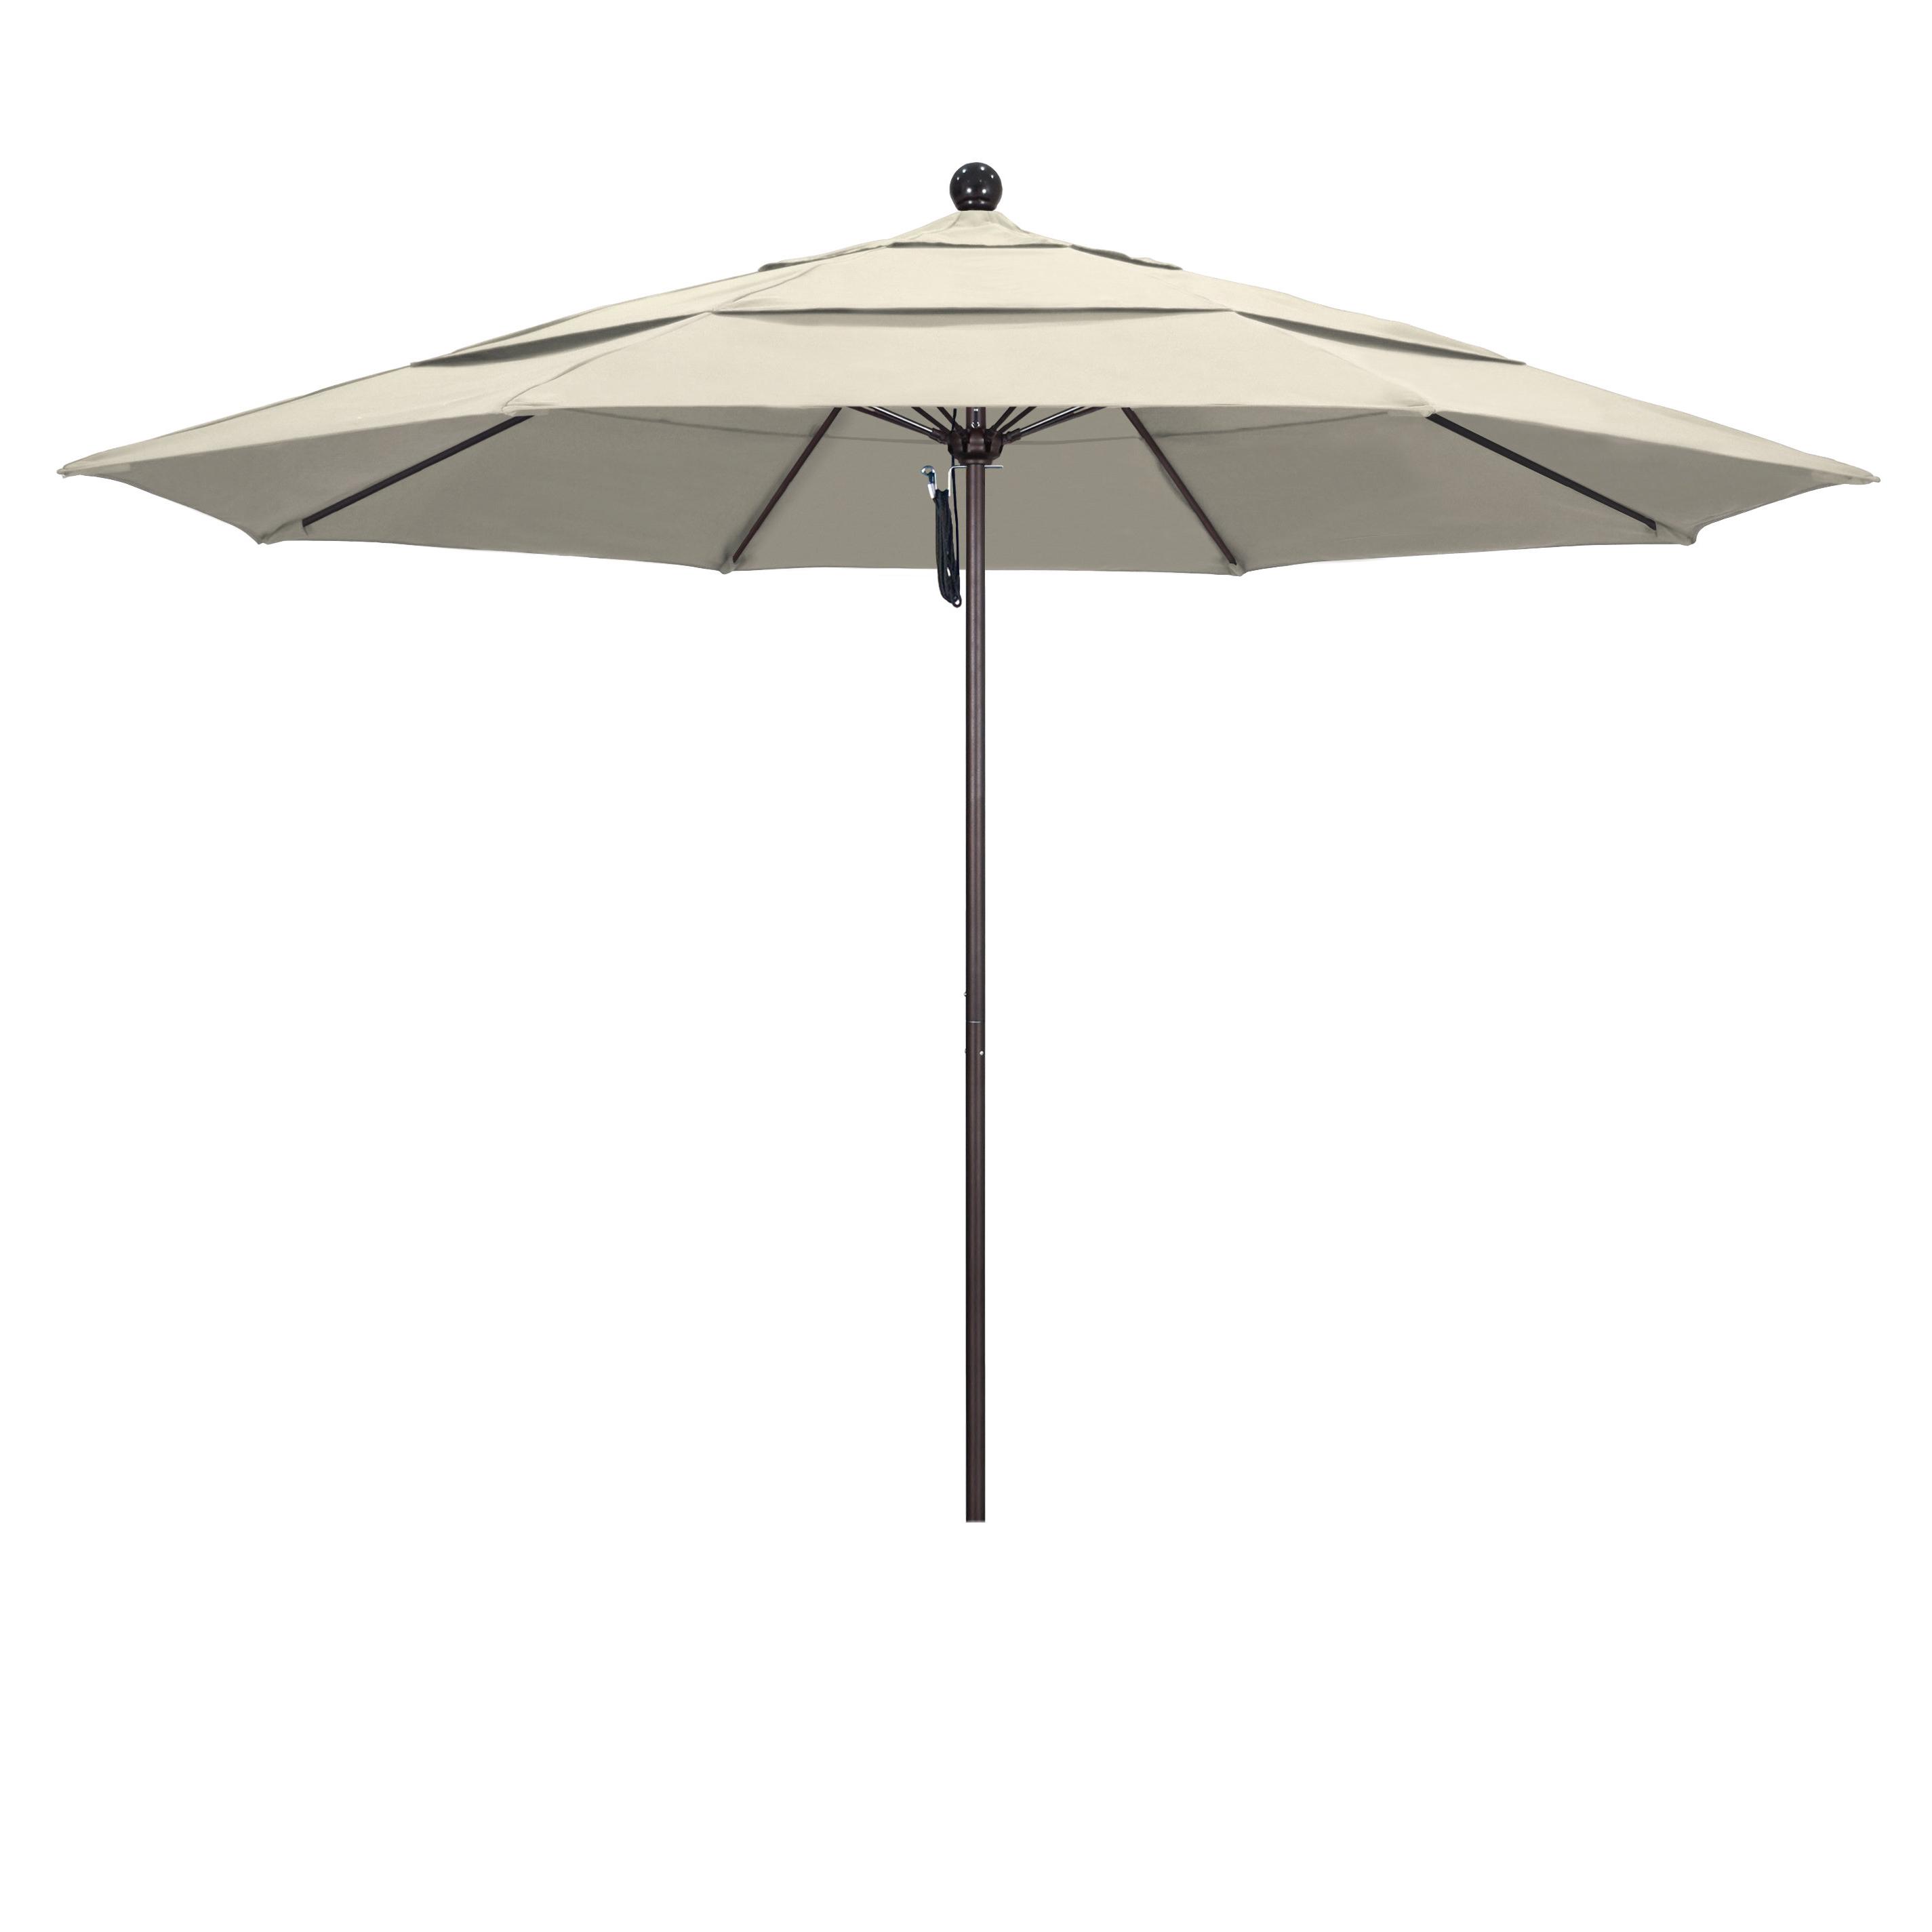 Trendy Delaplaine Market Umbrellas With Sol 72 Outdoor Duxbury 11' Market Umbrella (View 13 of 20)